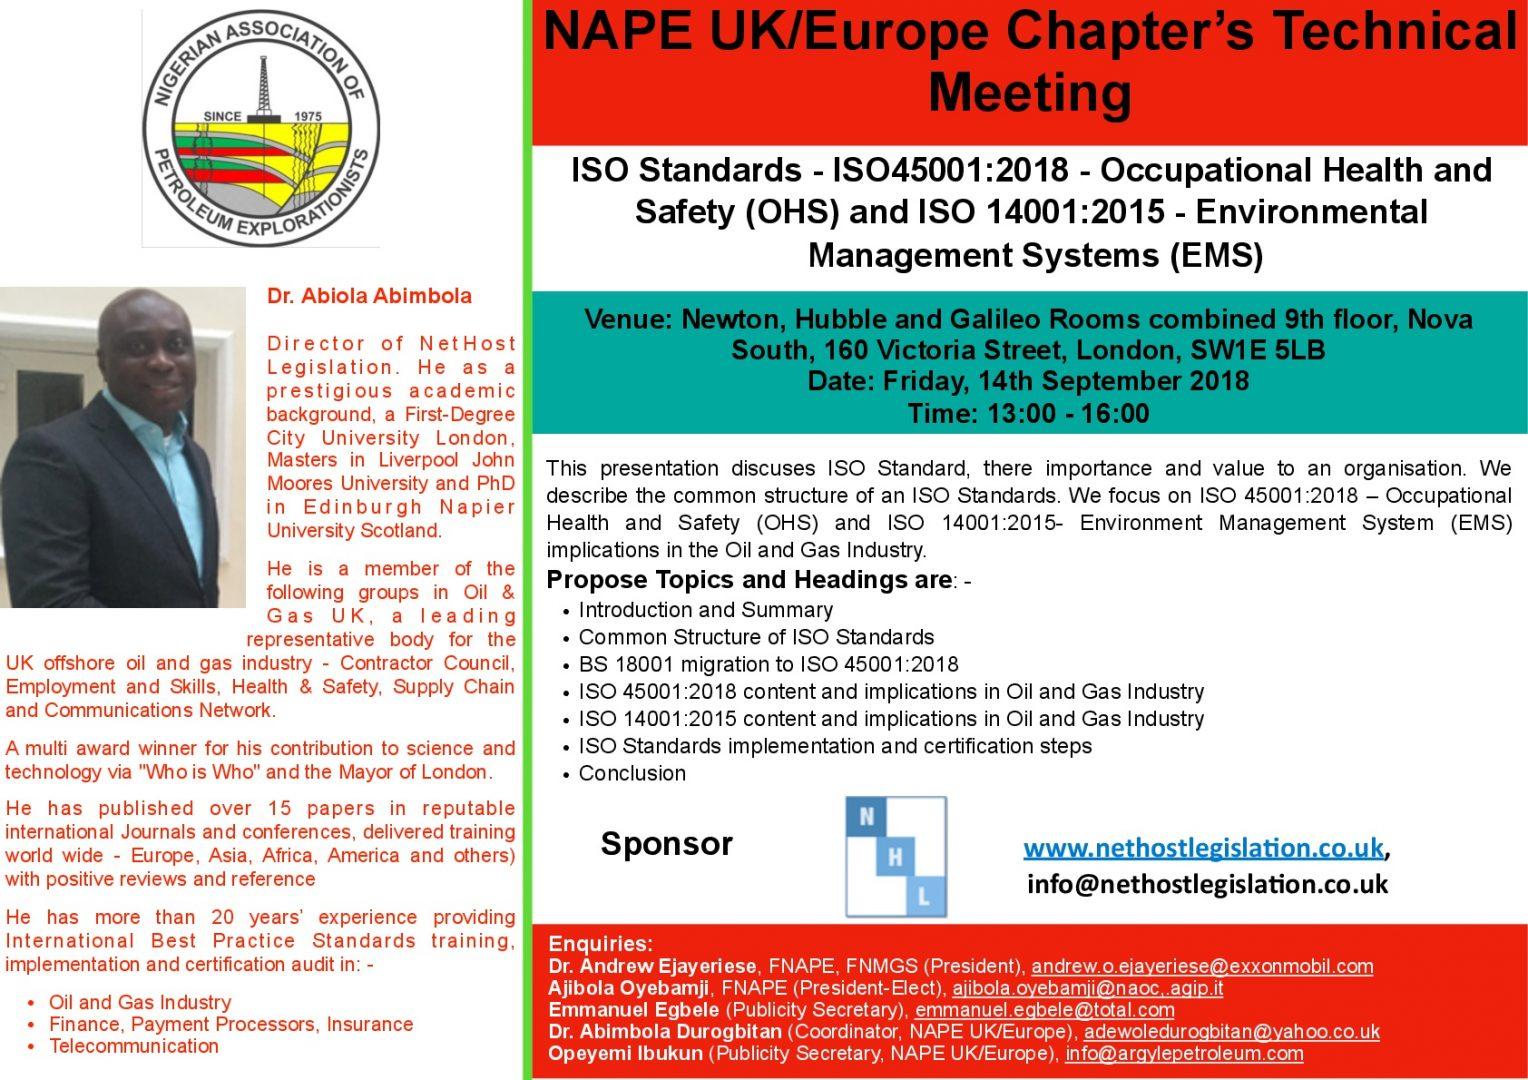 NAPE UKEuropeTMSeptember2018 1